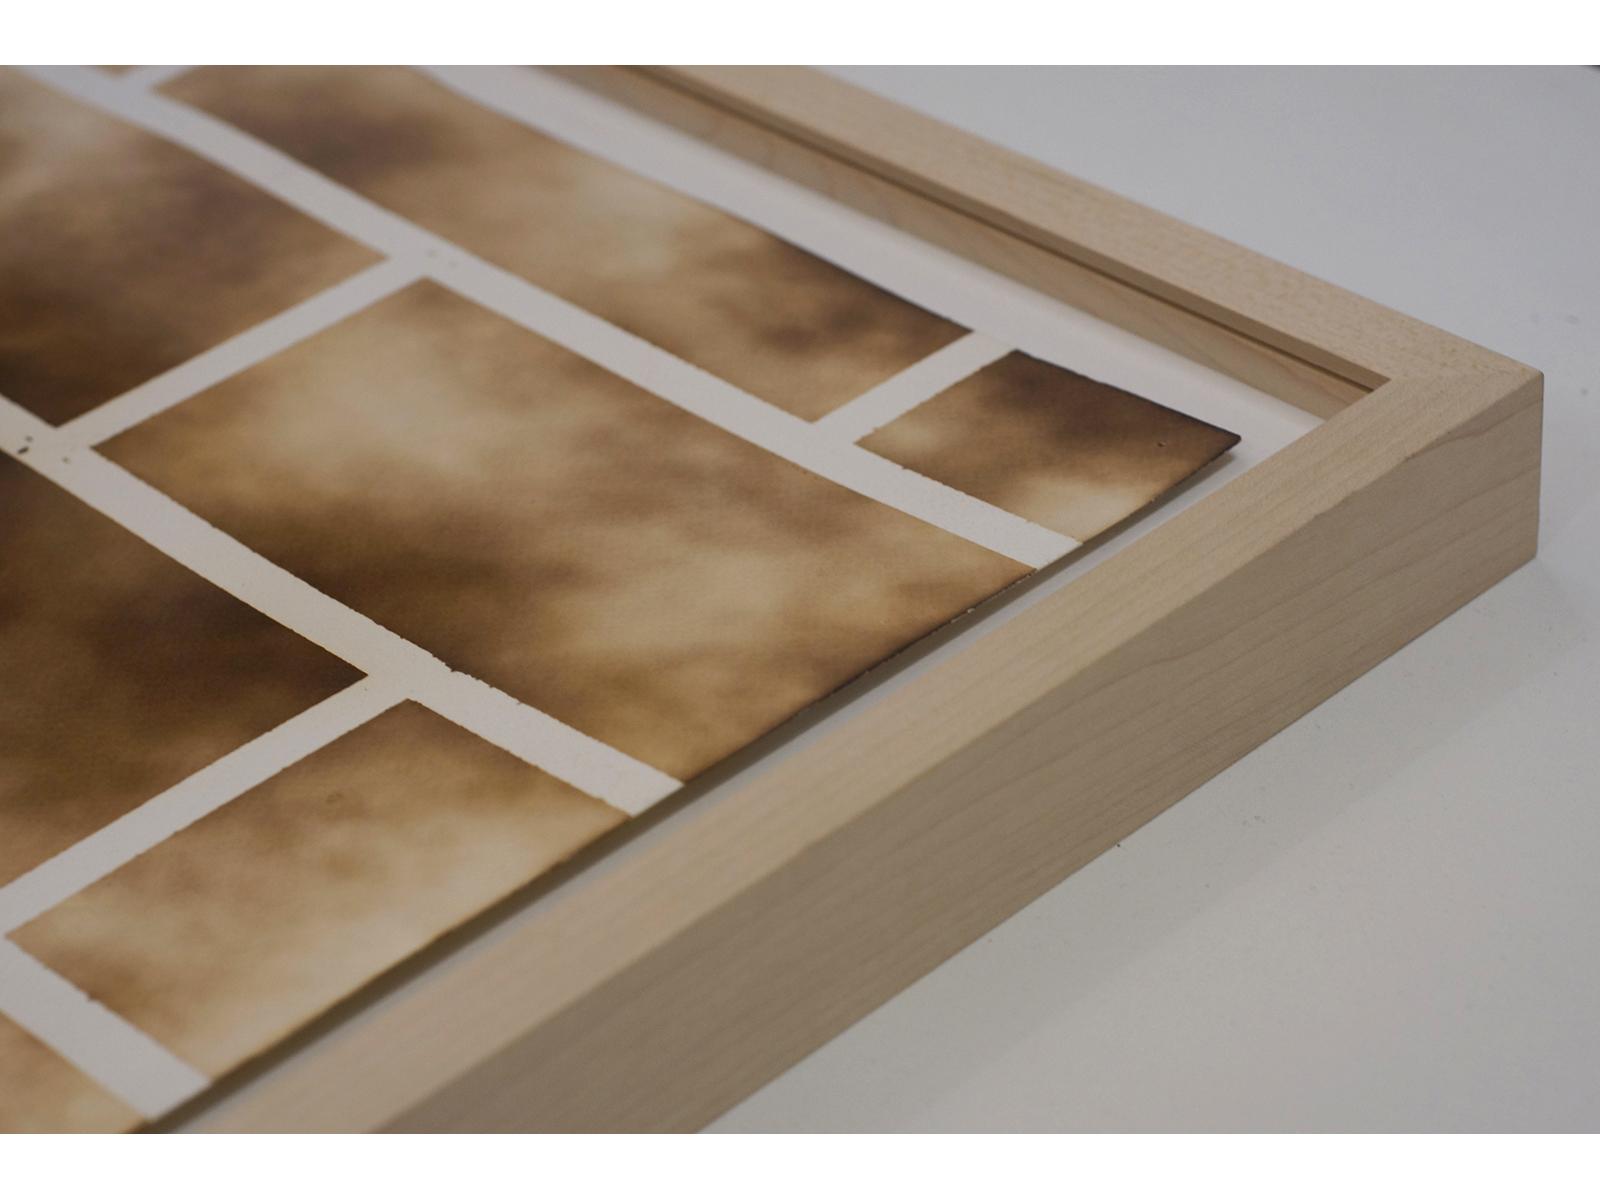 Benoit-Delaunay-artiste-dessin-2012-structure-detail-02-1600